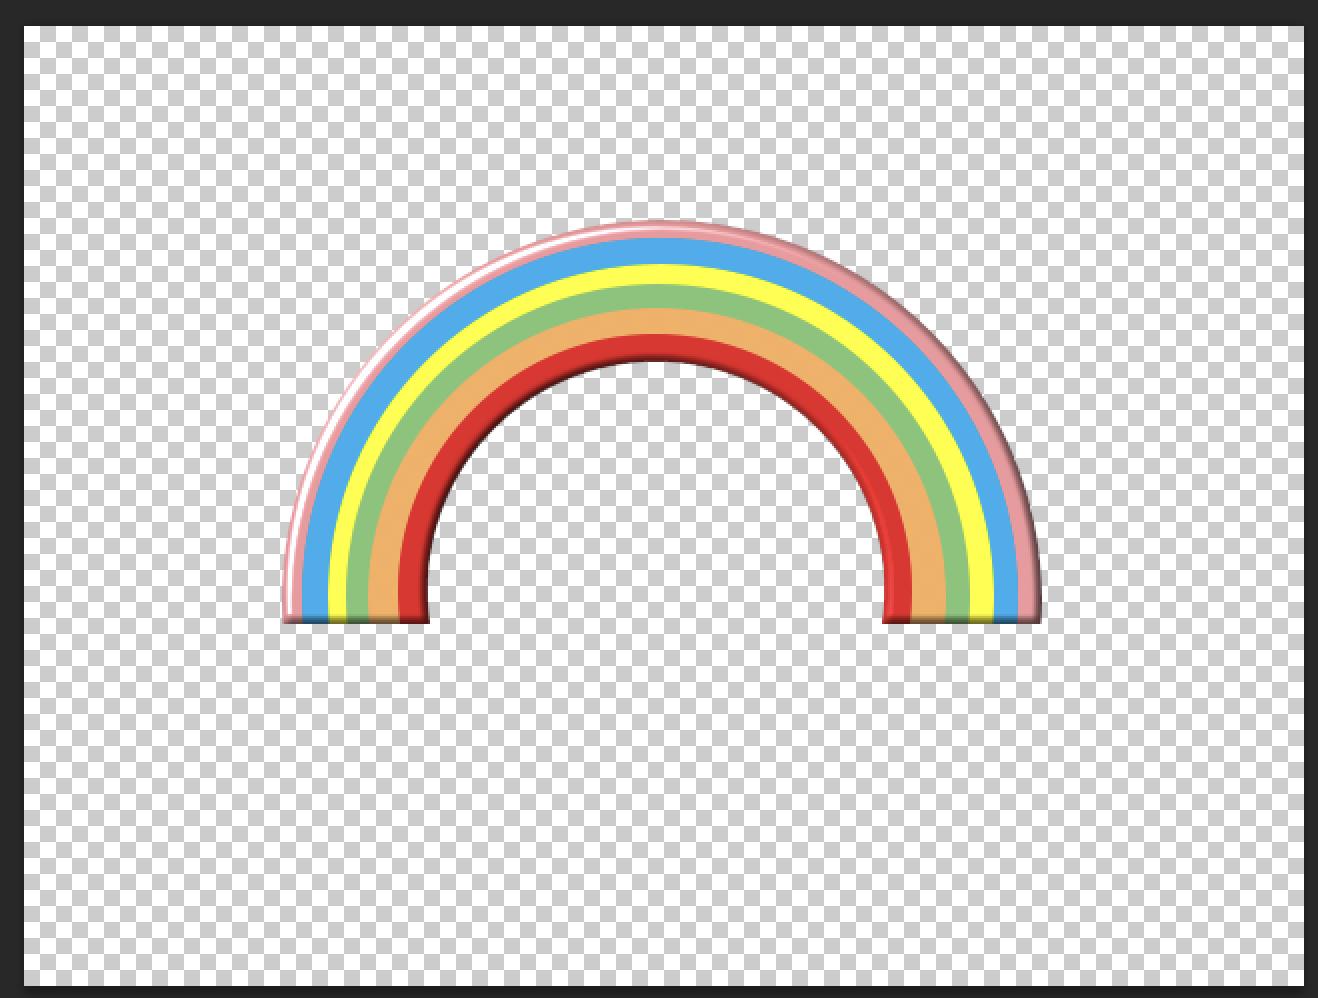 Rainbow Adobe Photoshop